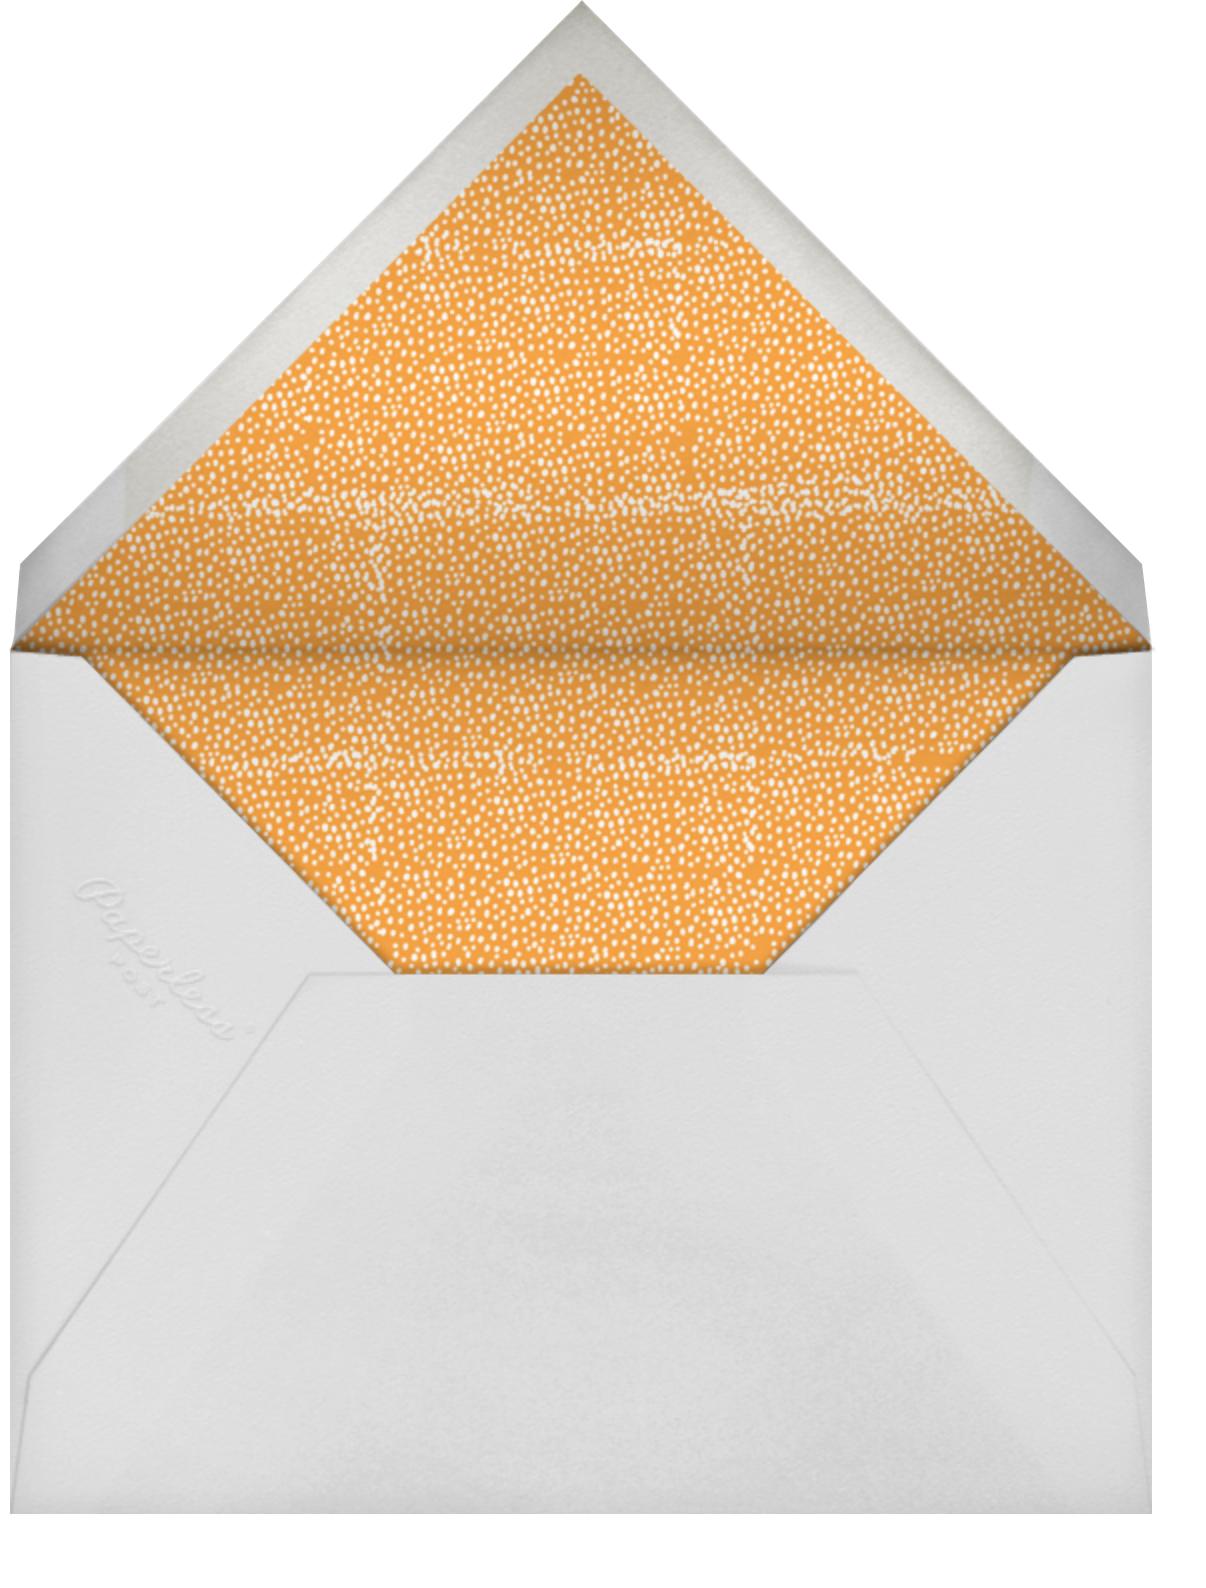 Floating with Love - Pond - Mr. Boddington's Studio - Birth - envelope back